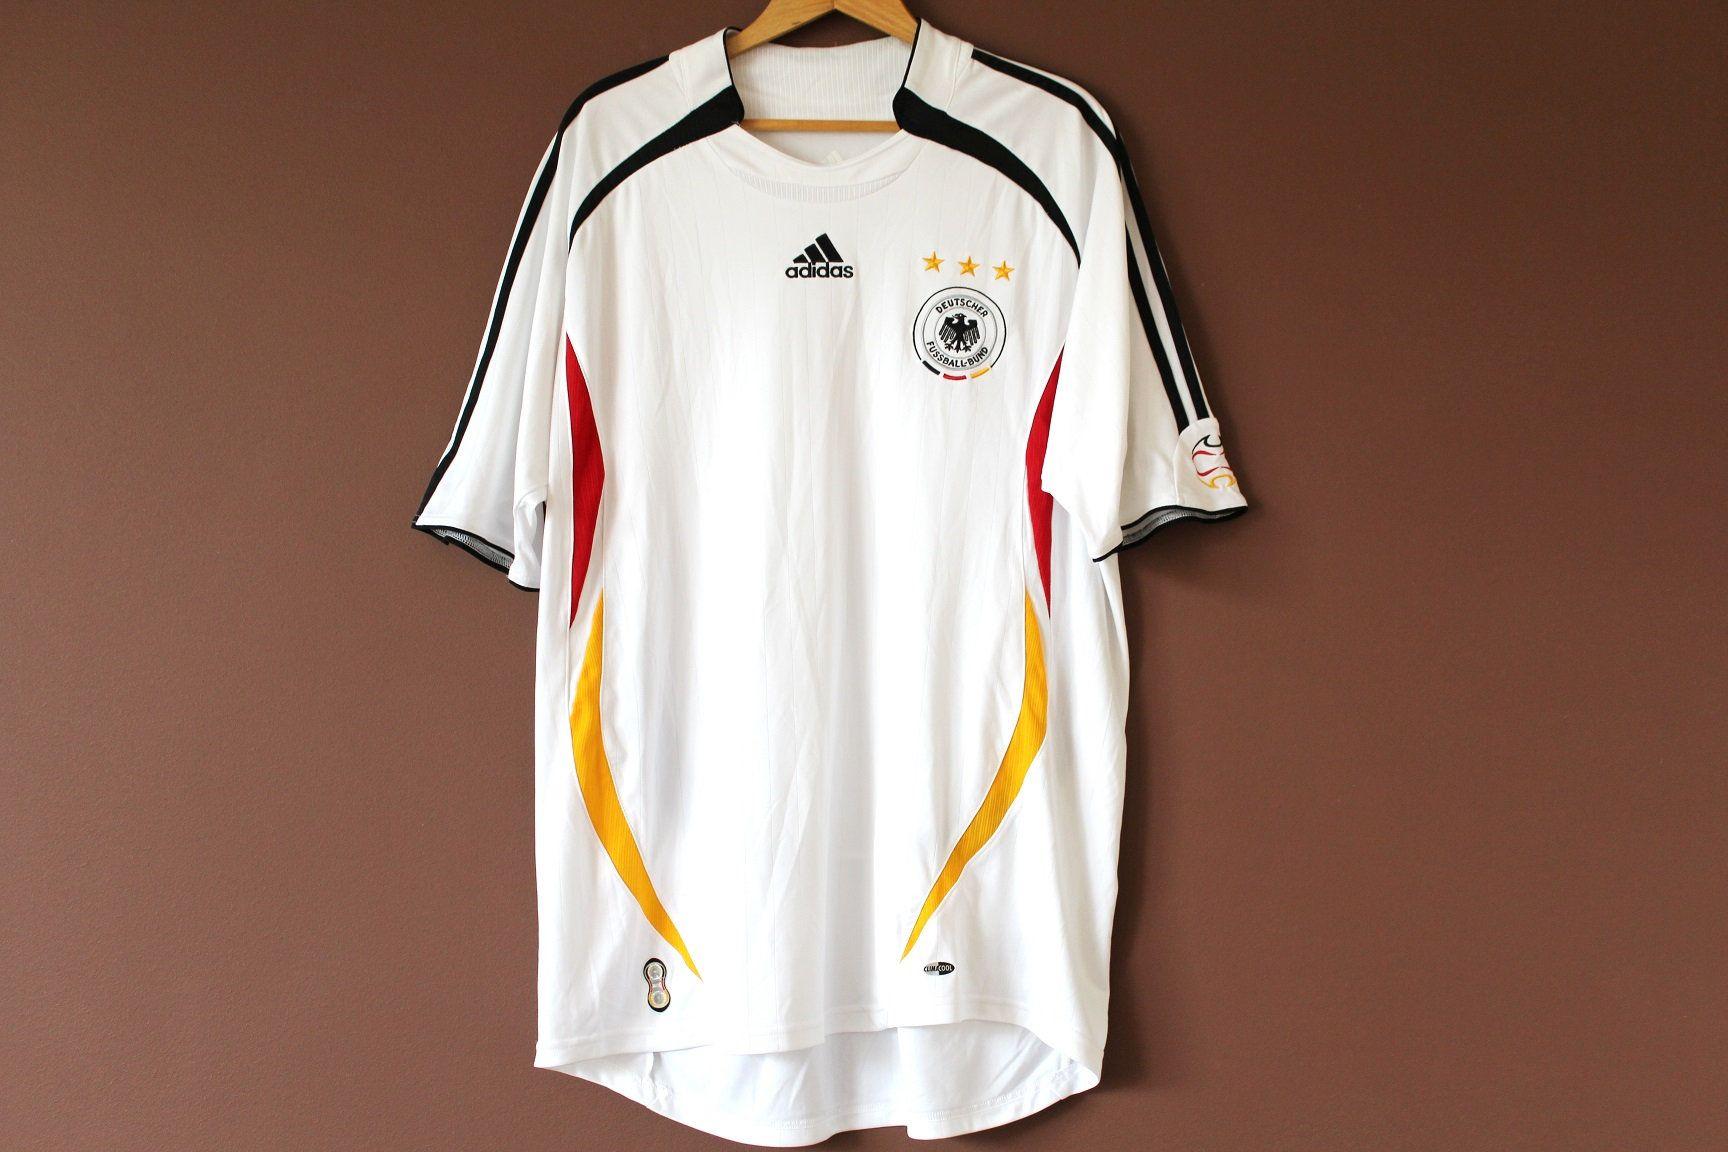 Vintage Football Germany Shirt White Adidas Jersey Training Etsy Germany Shirt White Adidas Vintage Adidas [ 1152 x 1728 Pixel ]